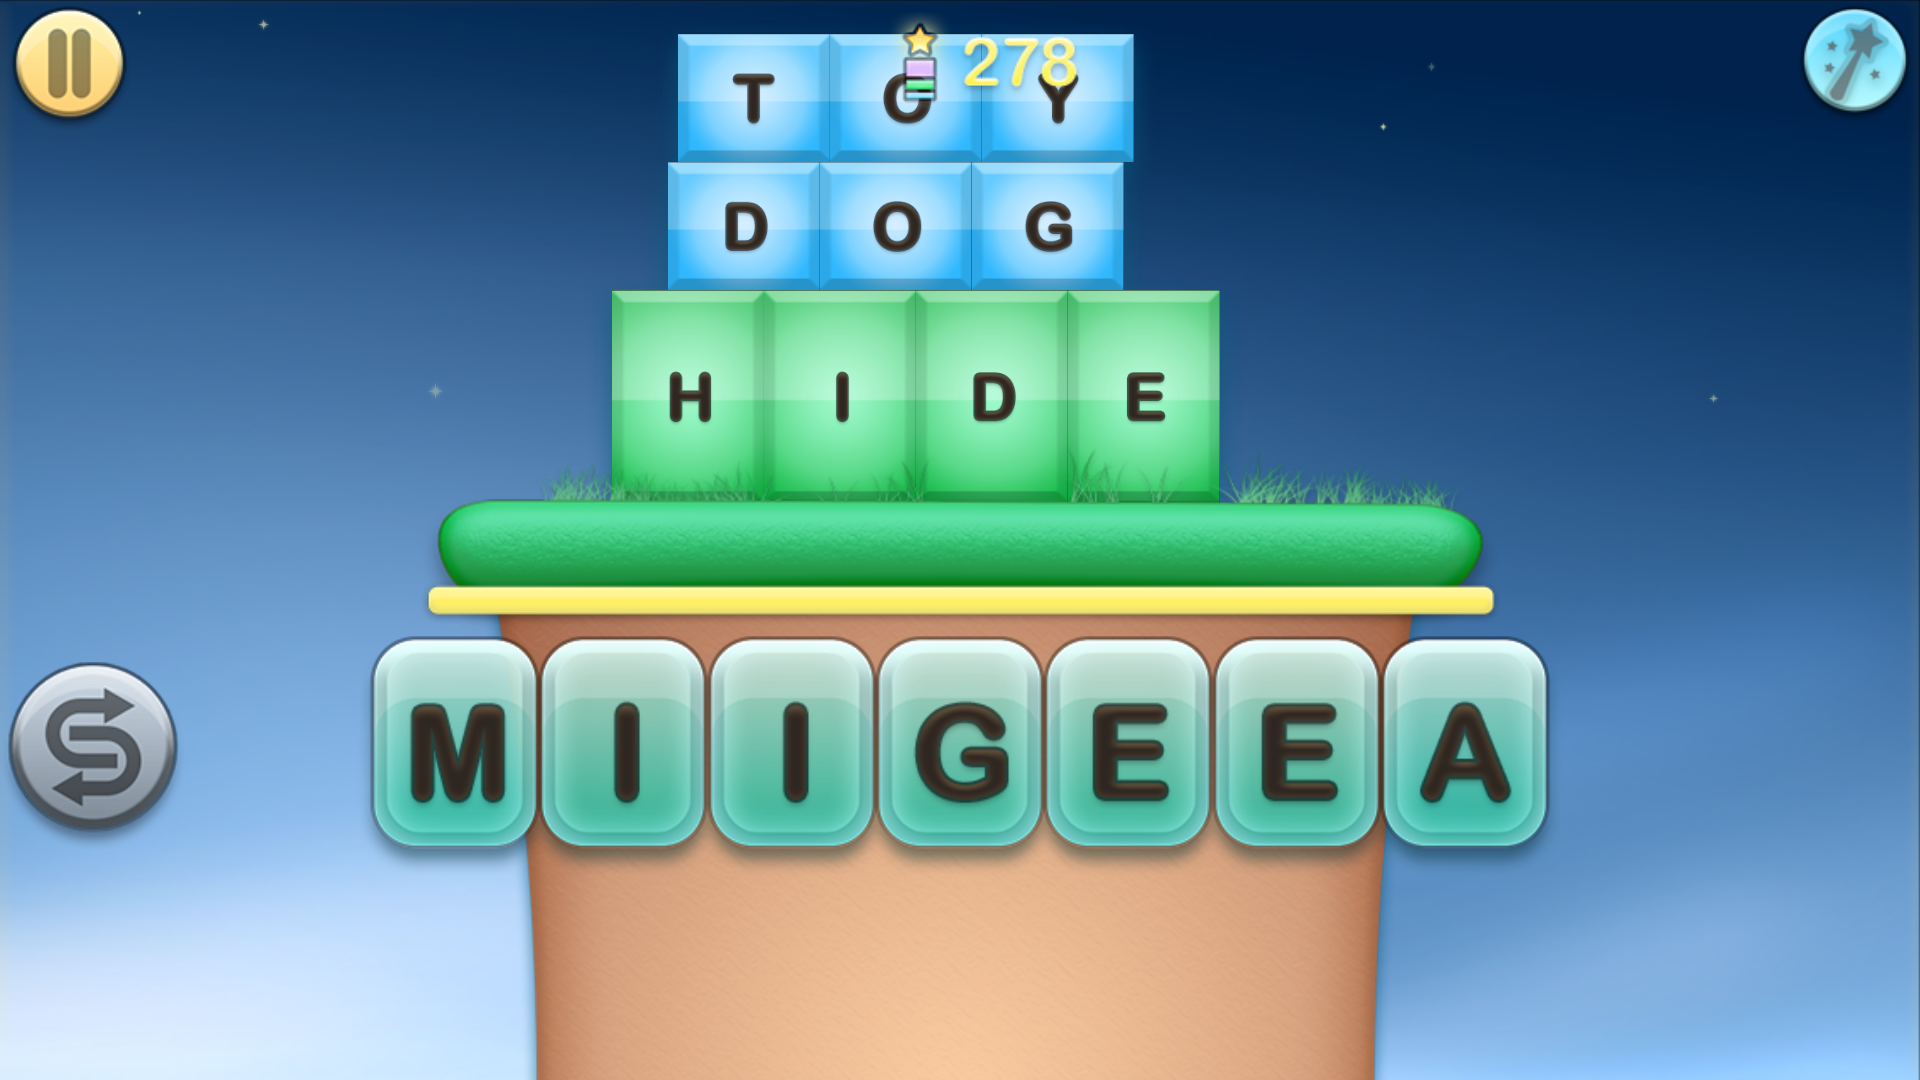 Jumbline 2 - word game puzzle screenshot #4